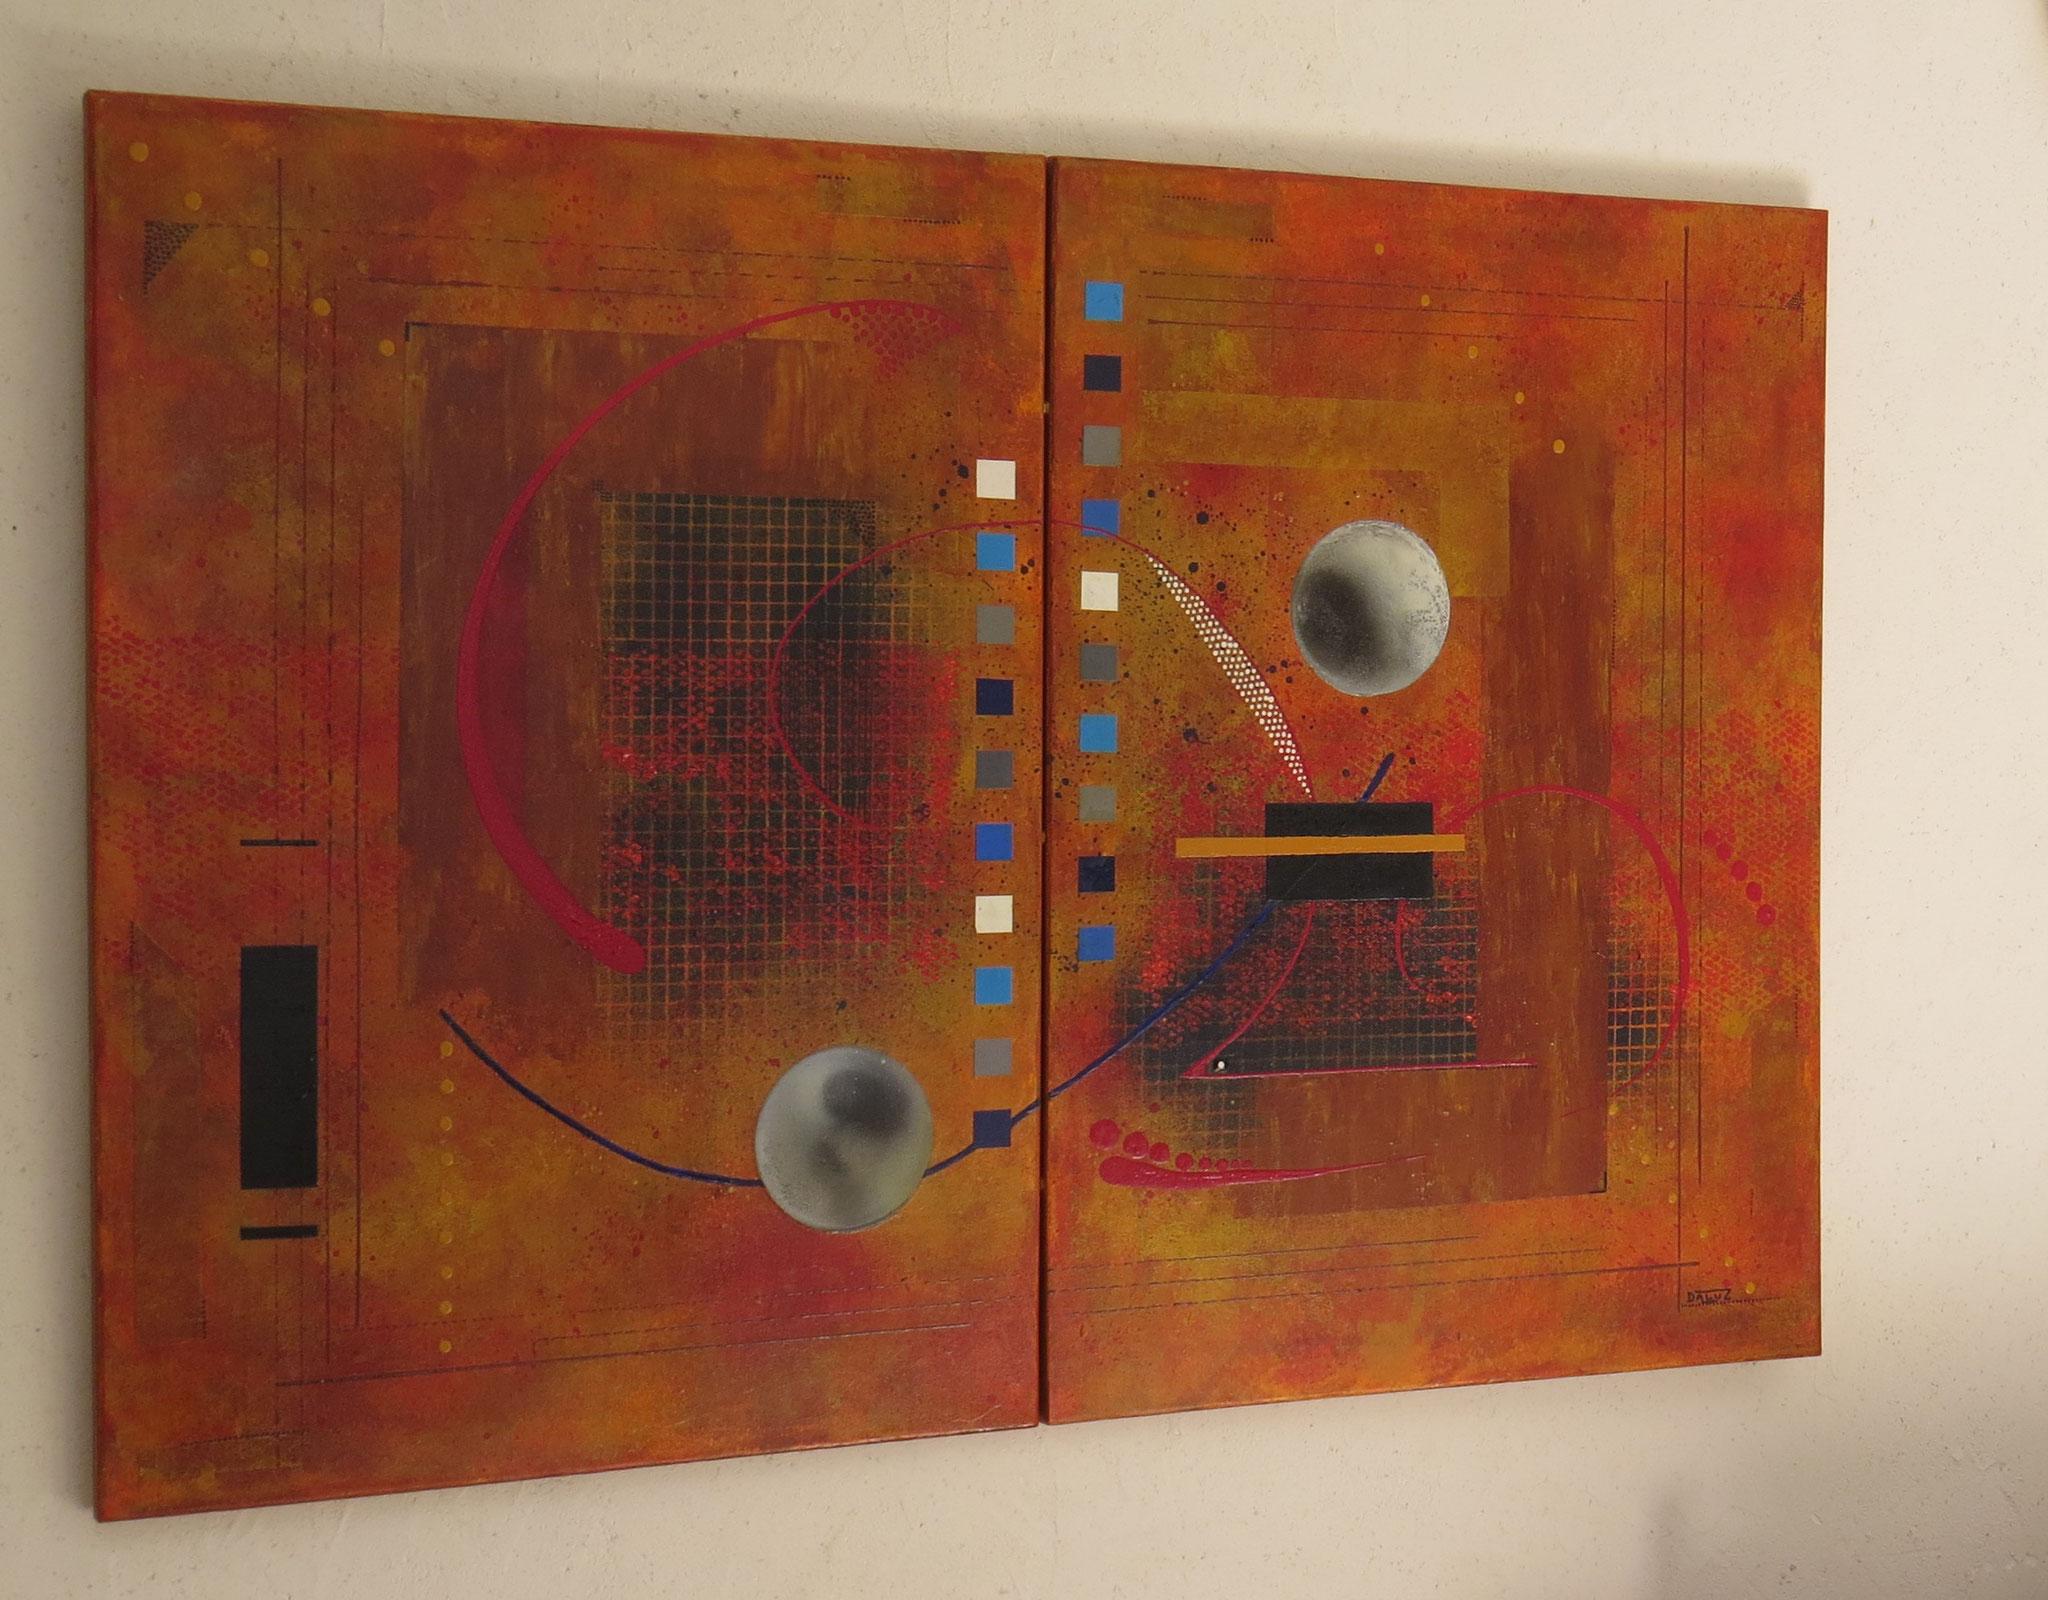 dzëta - vue côté1 - DALUZ GALEGO - peinture abstraite